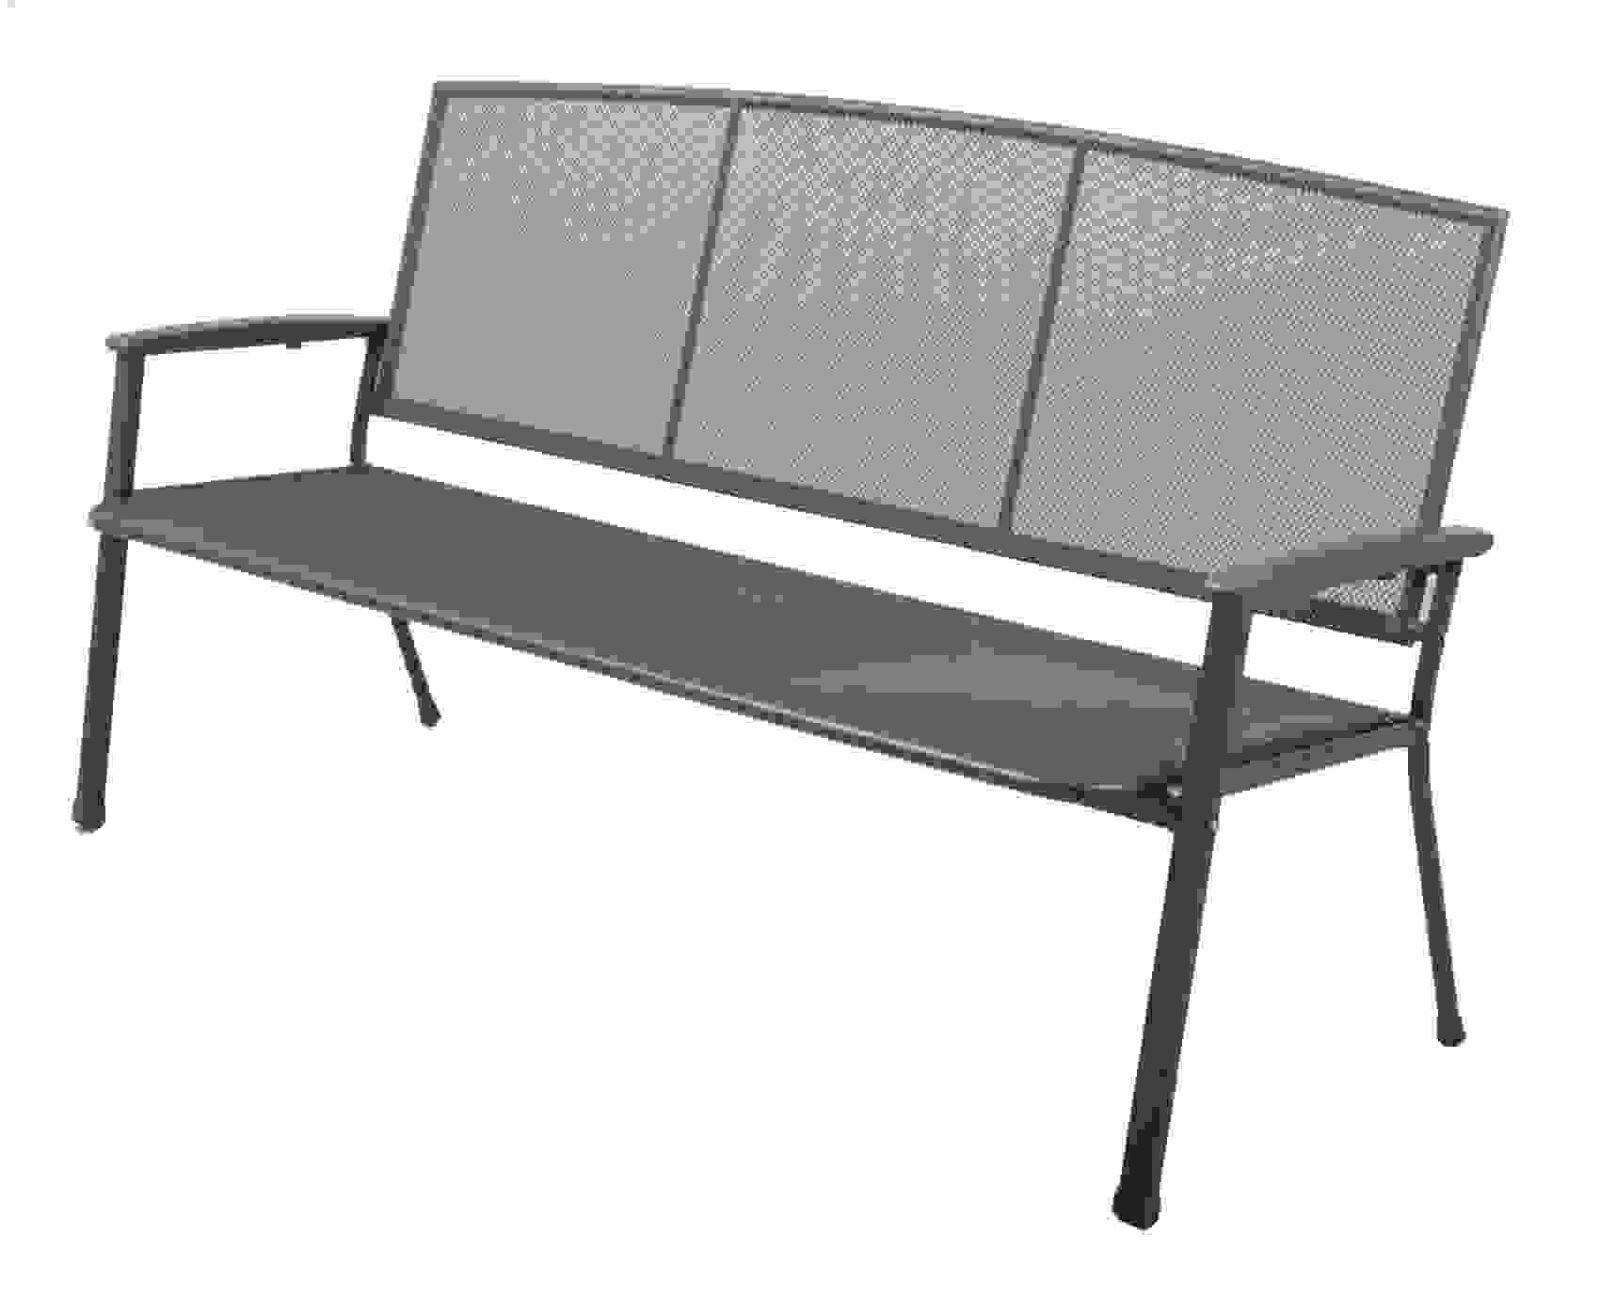 Exclusive Gartenbank Rivo 3 Sitzer Aus Metall Streckmetall Schema von Gartenbank 3 Sitzer Metall Photo